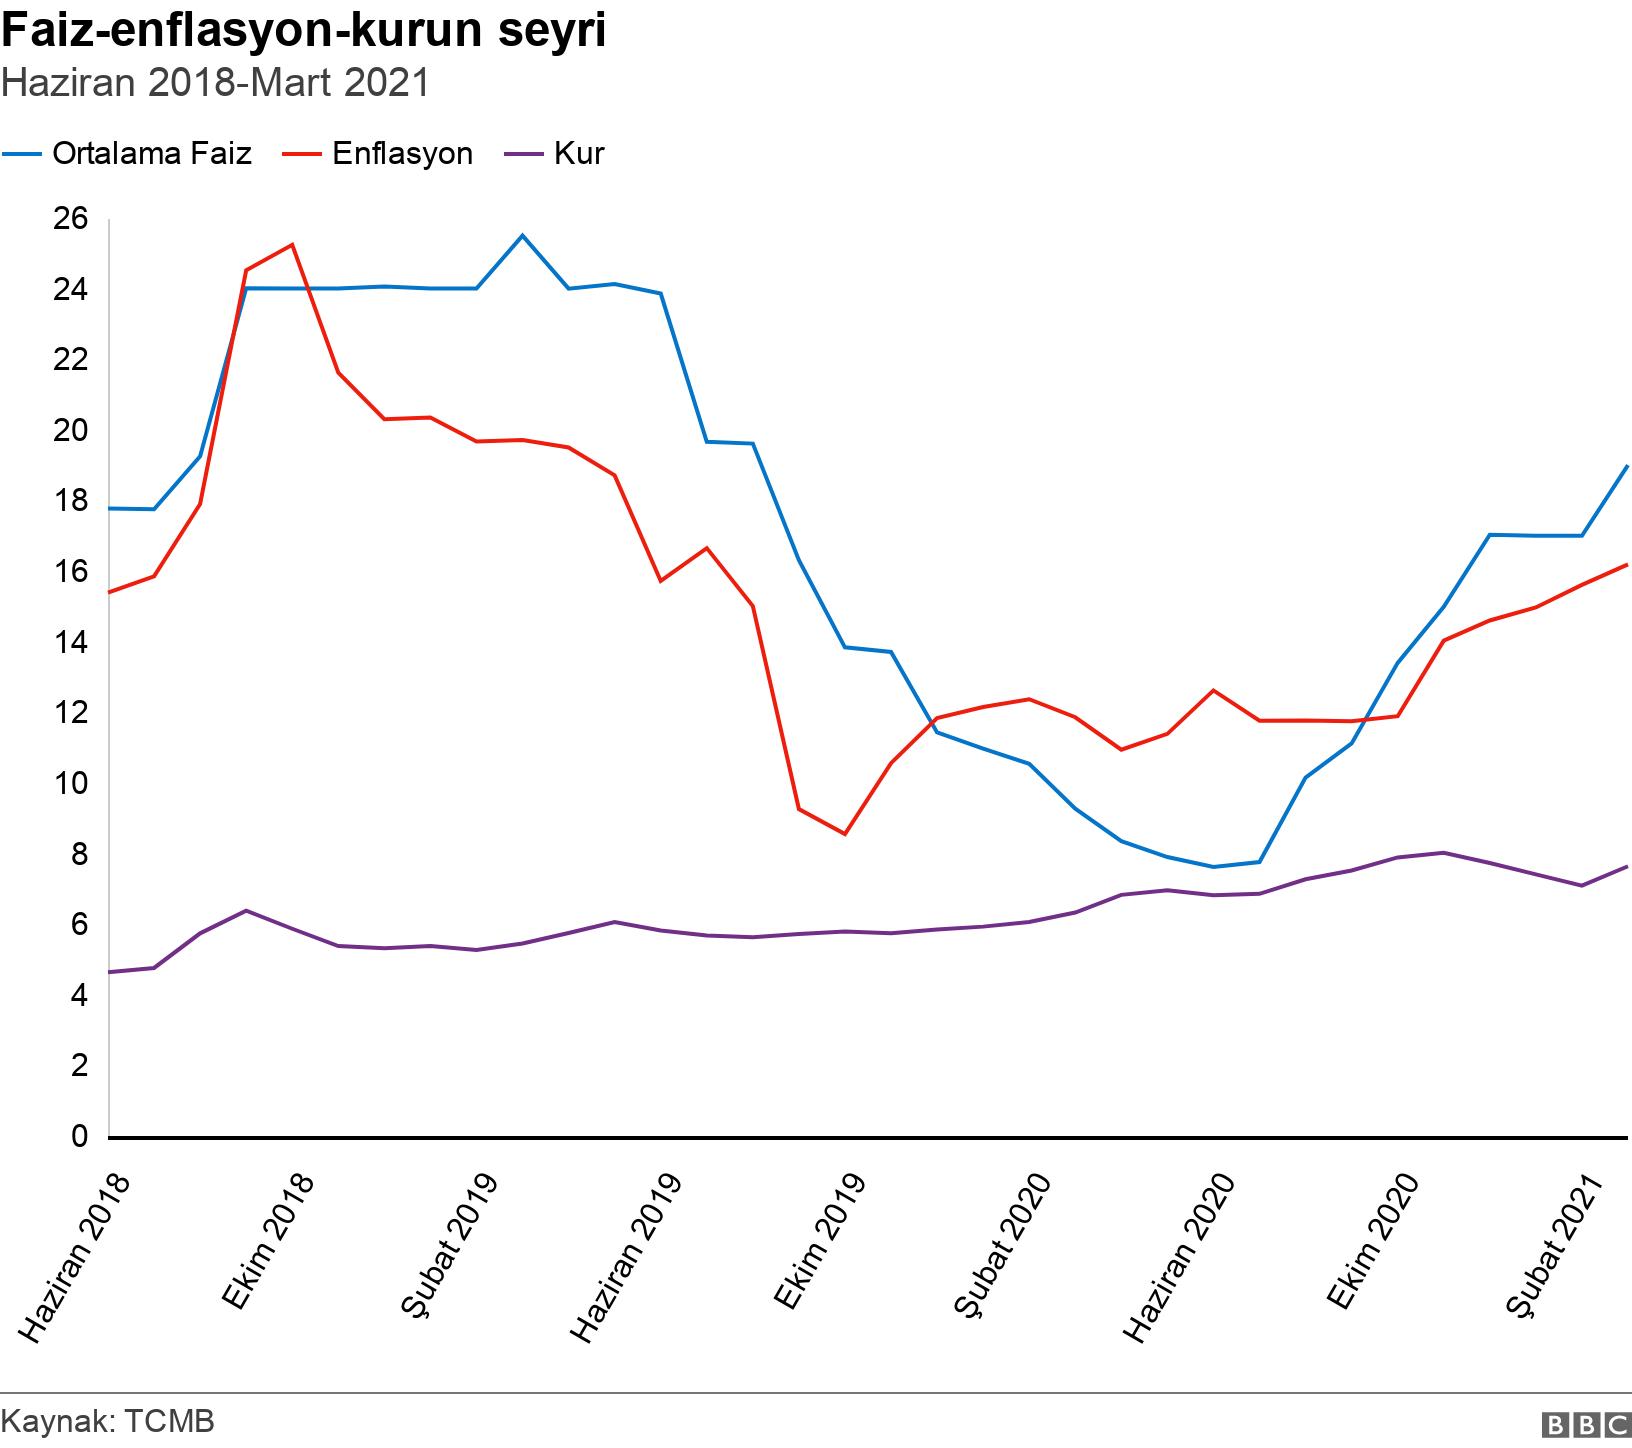 Faiz-enflasyon-kurun seyri. Haziran 2018-Mart 2021.  .